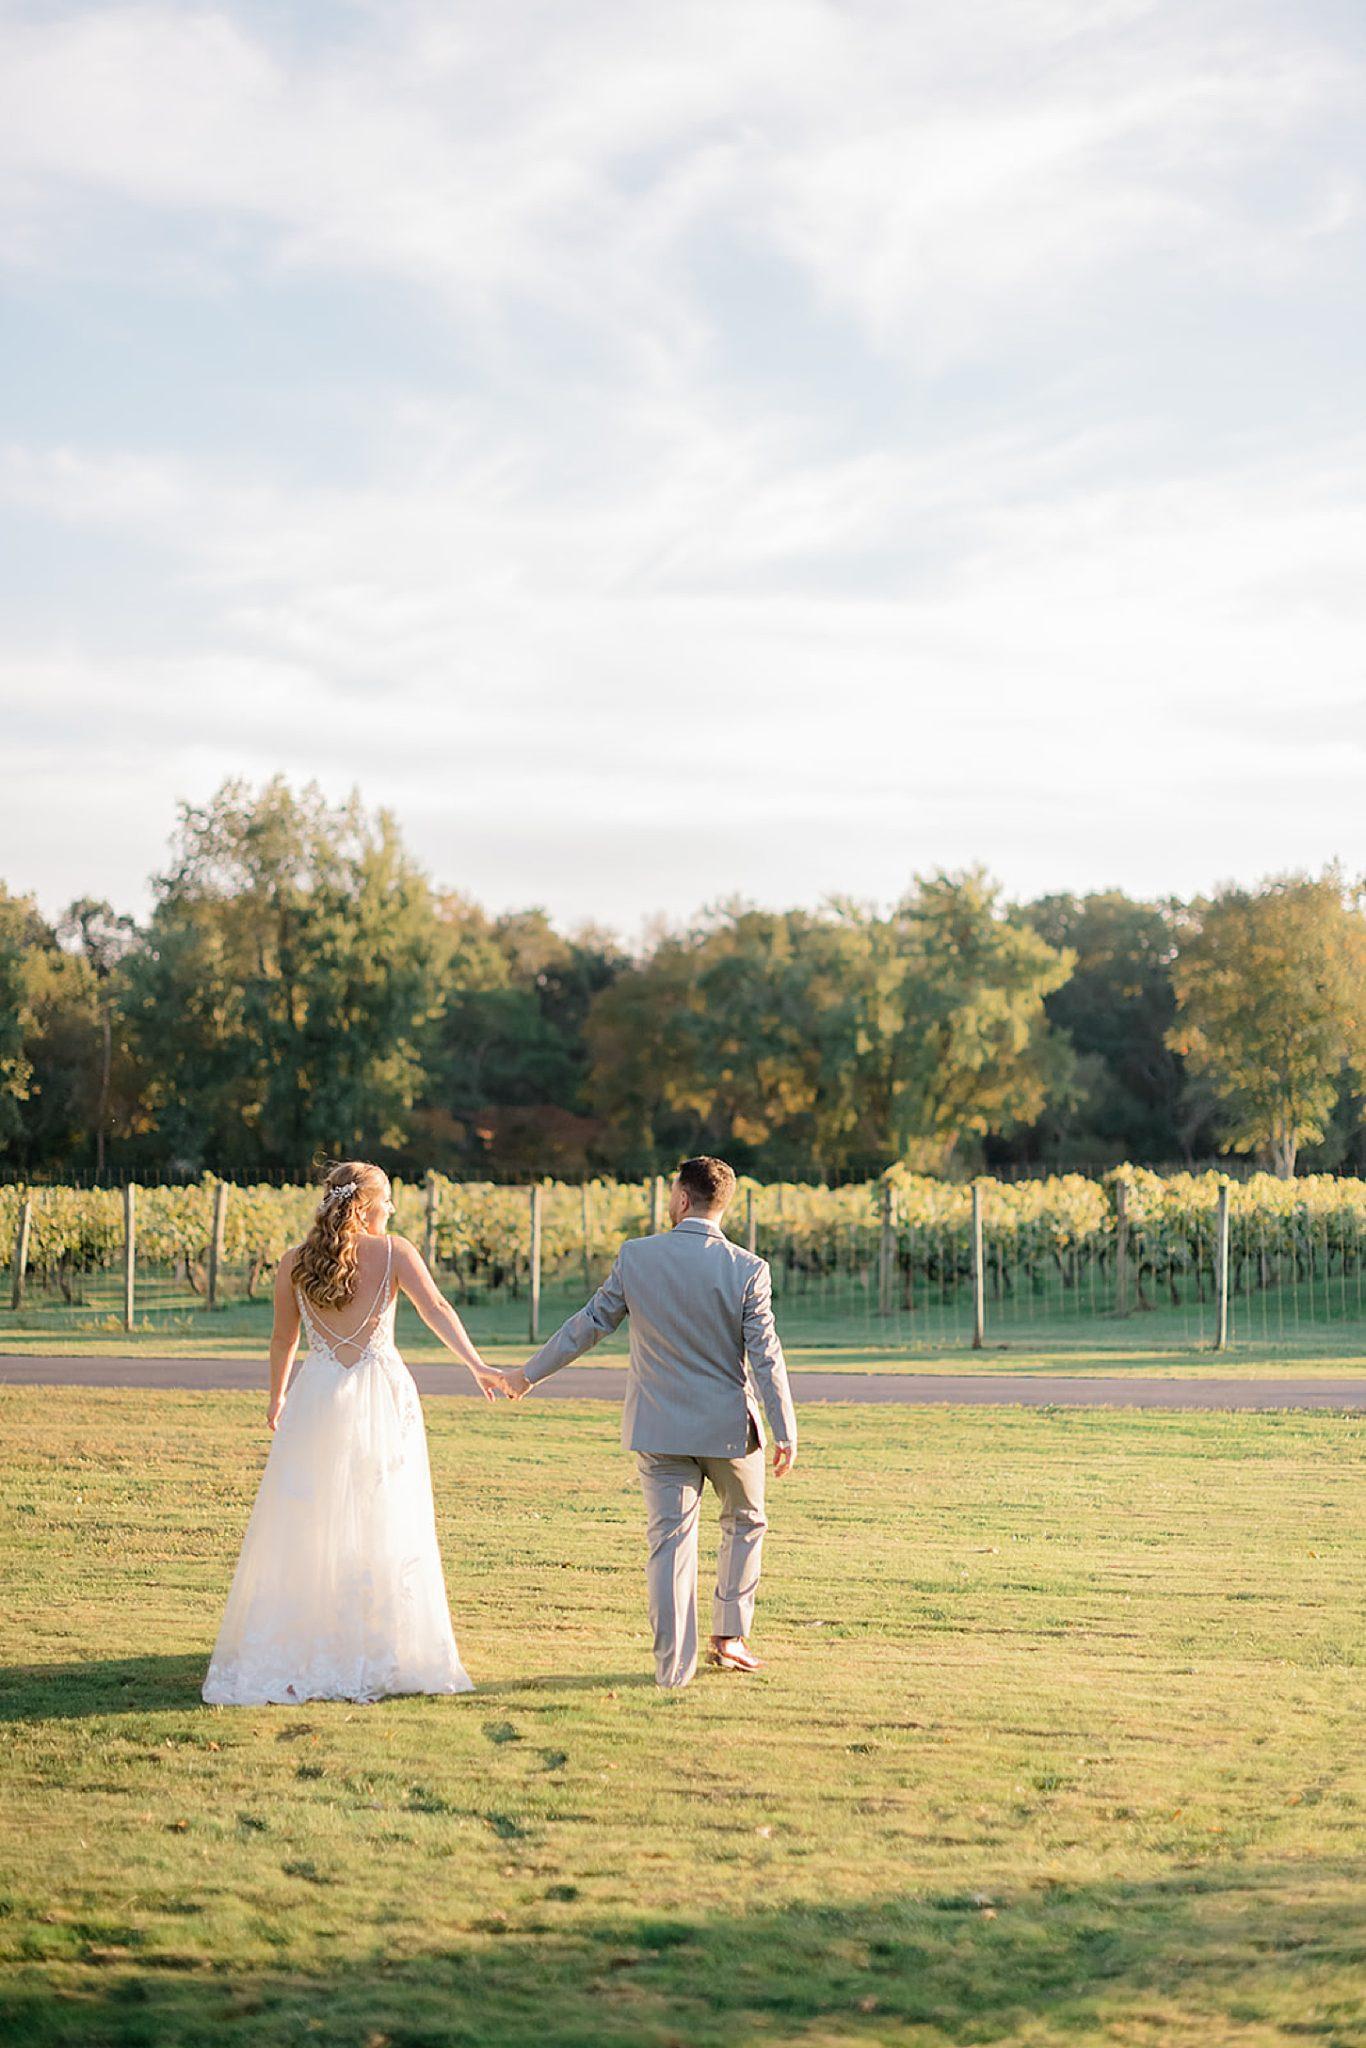 Valenzano Winery Vitners Pavillion Wedding Photography by Magdalena Studios 0030 scaled